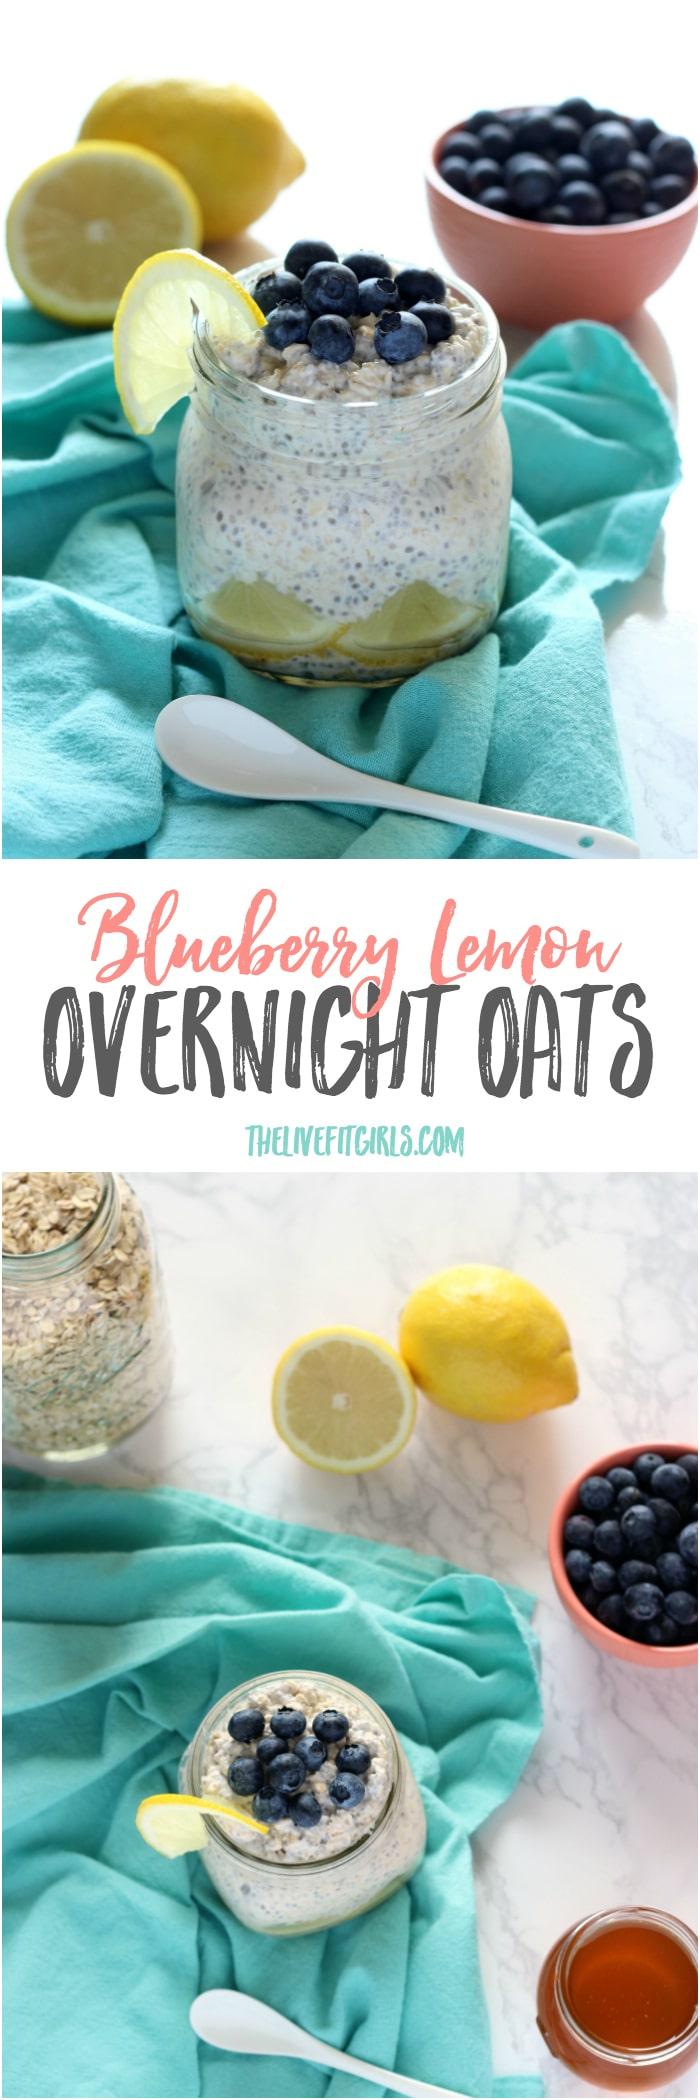 Blueberry Lemon Overnight Oats Pin